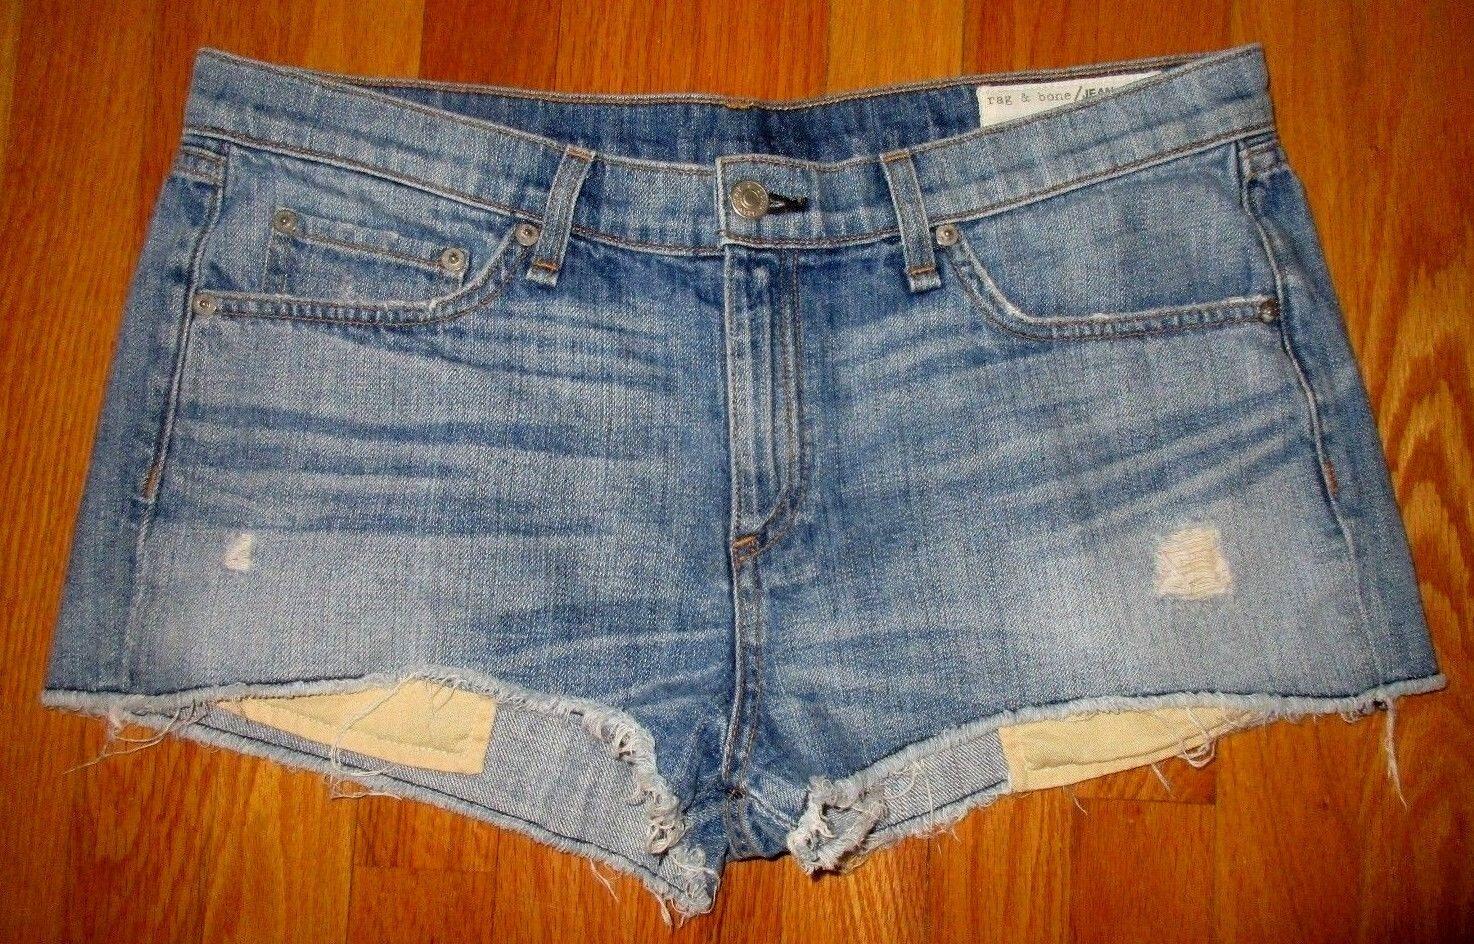 Rag & Bone Mila Distressed Destroy Denim Cut Off Jean Shorts Moss Size 31